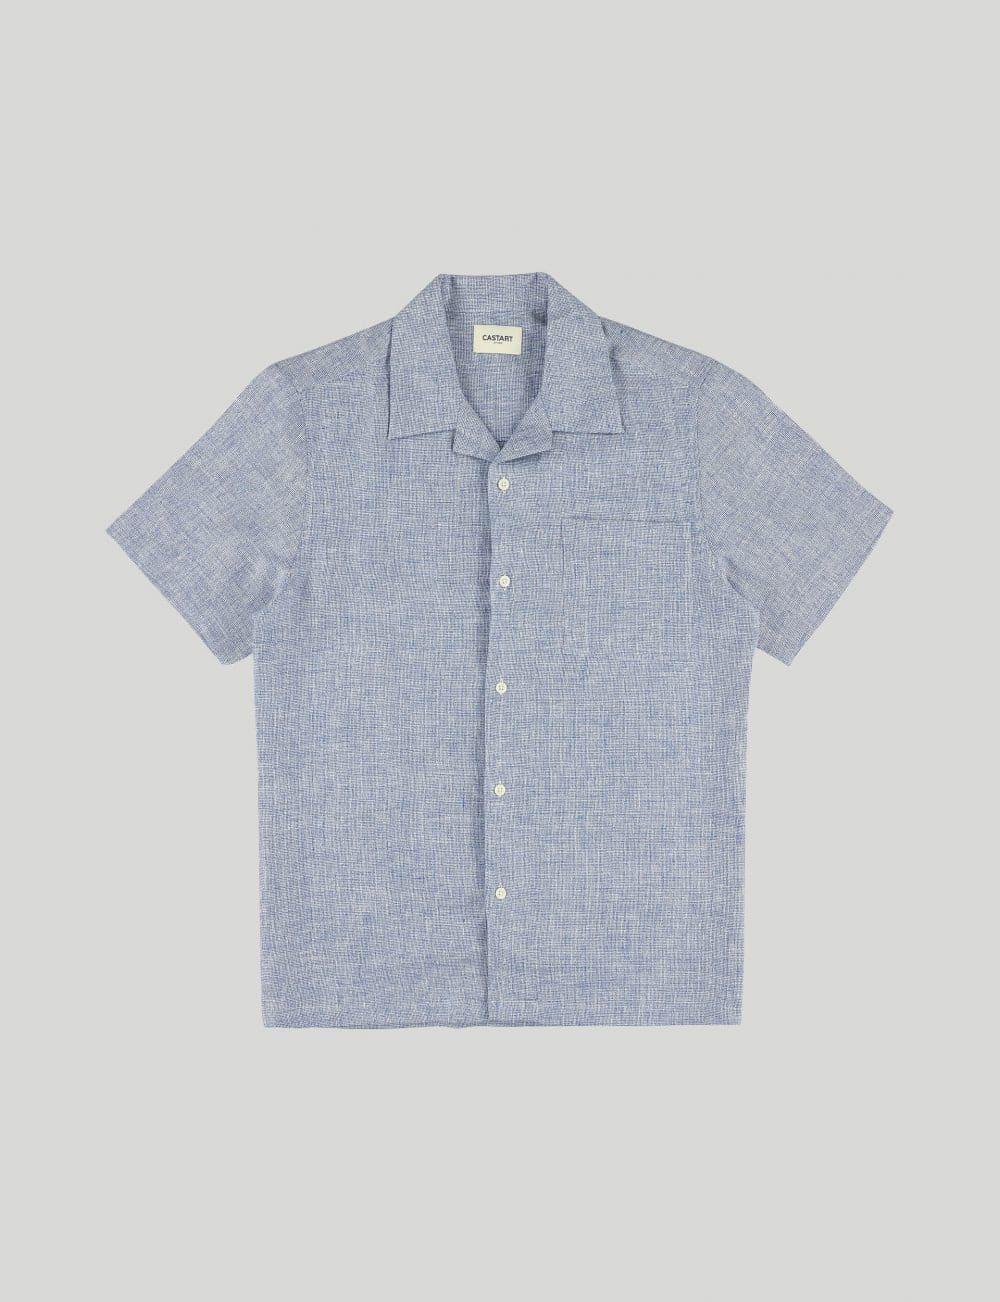 Castart - Devilshead SL Shirt - Middle Blue